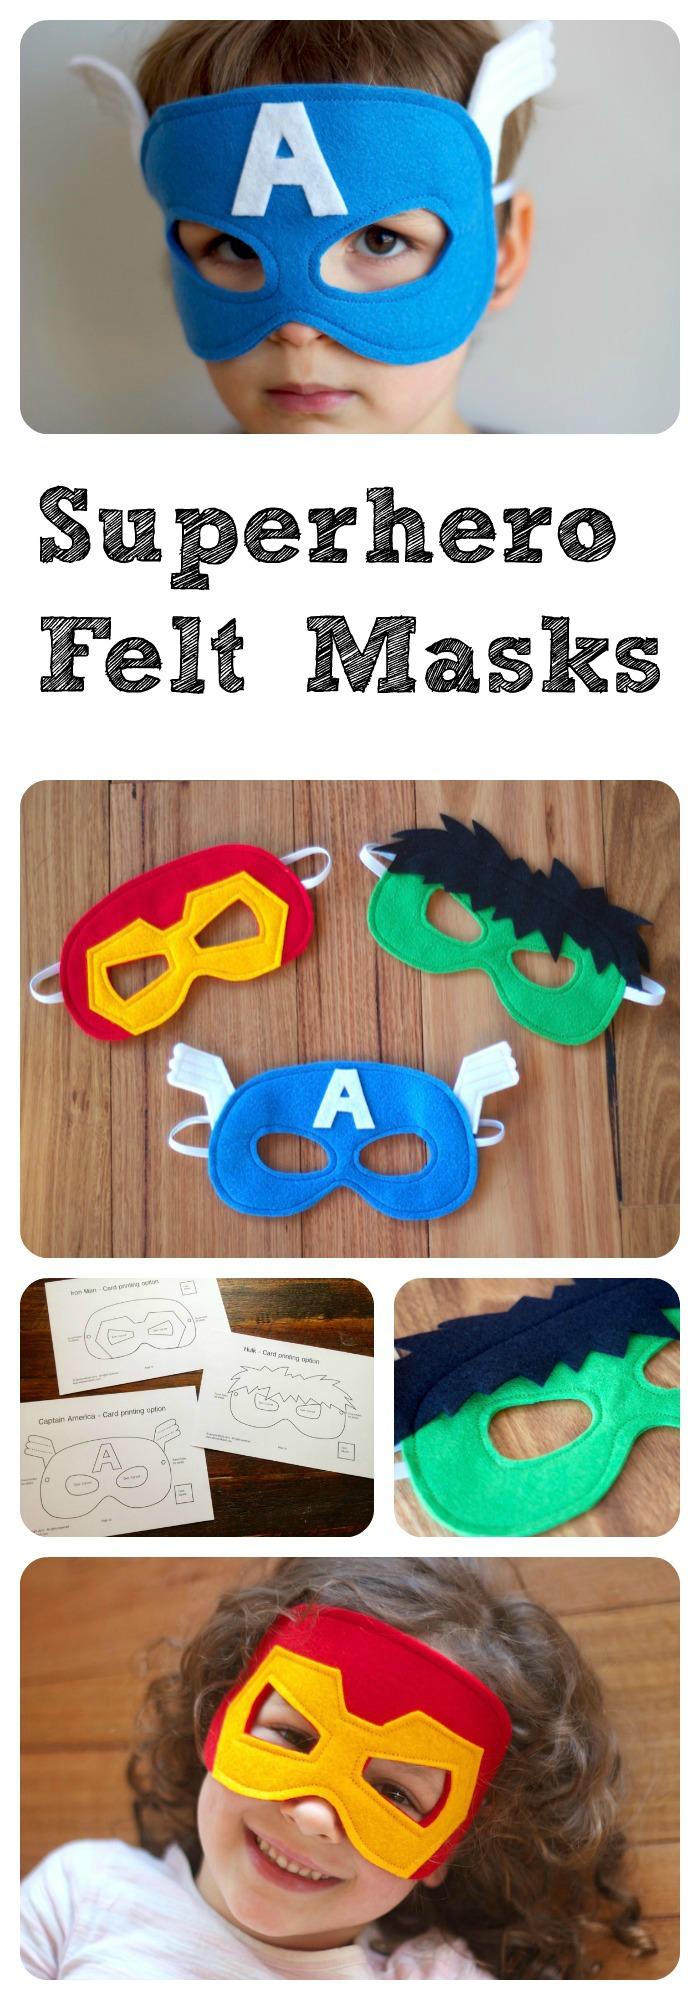 Superhero Felt Masks - A PDF sewing pattern - Captain America, Hulk and Ironman